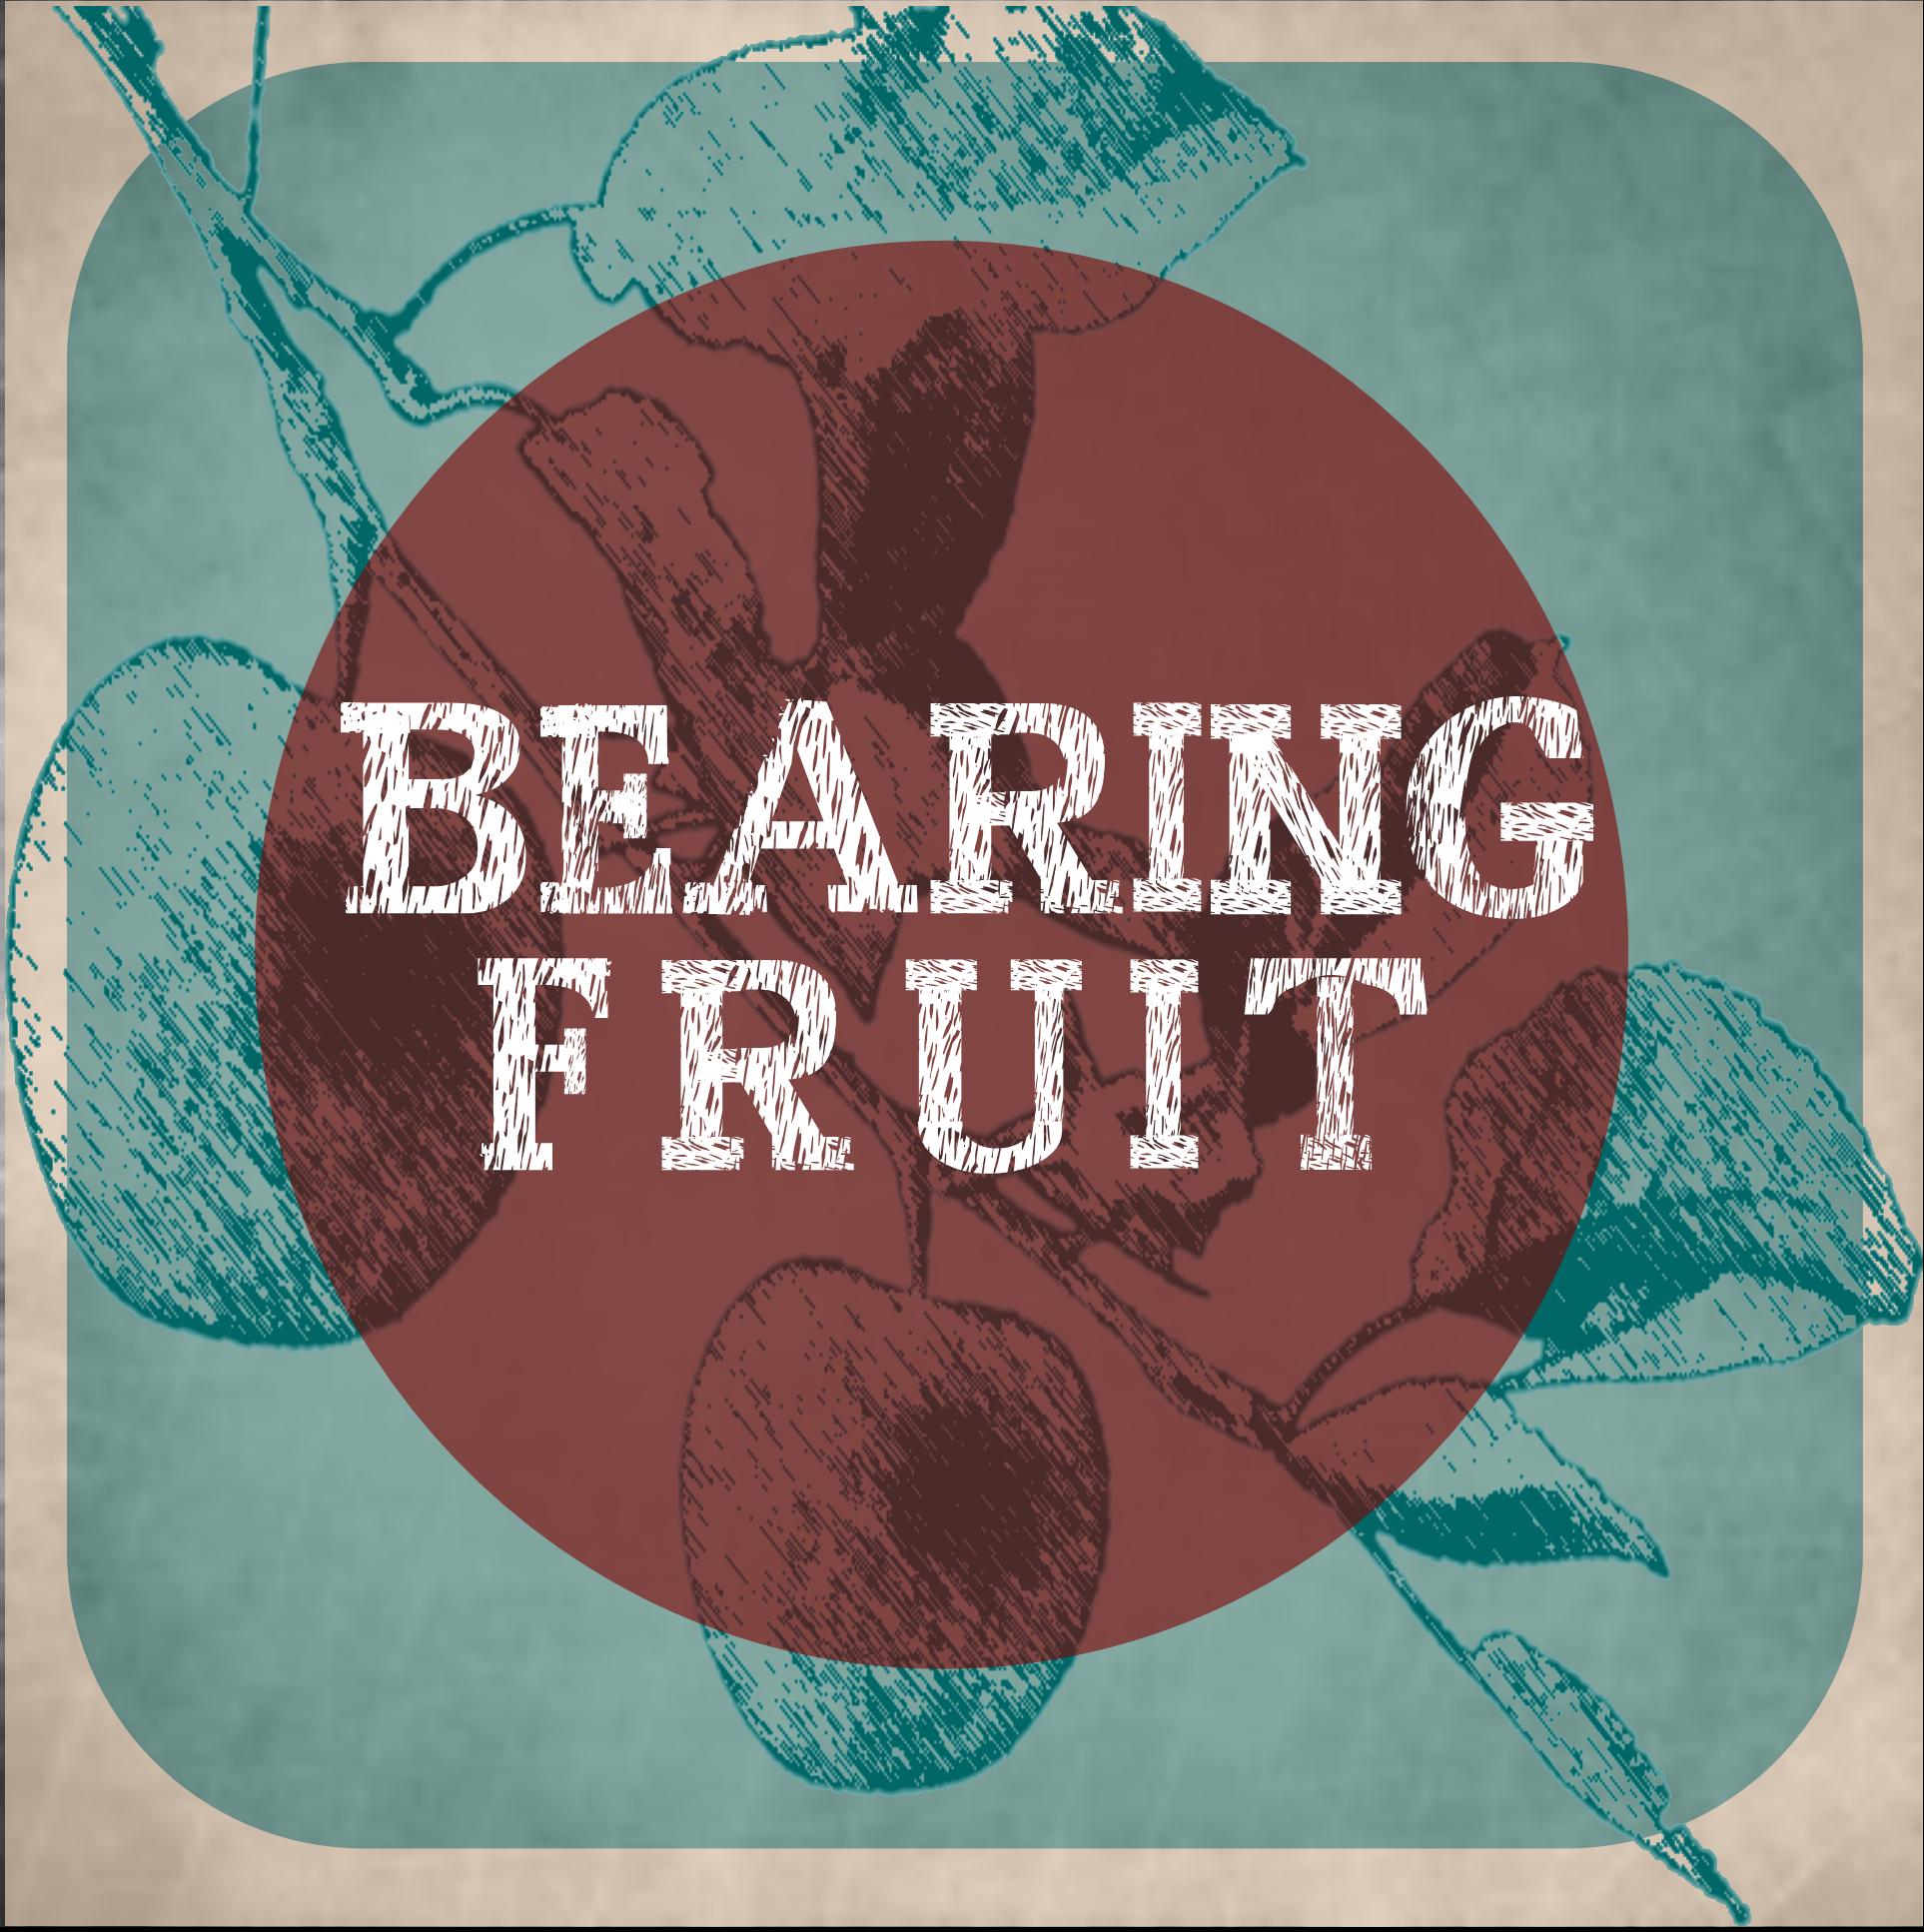 Bearing Fruit for web.jpg.png